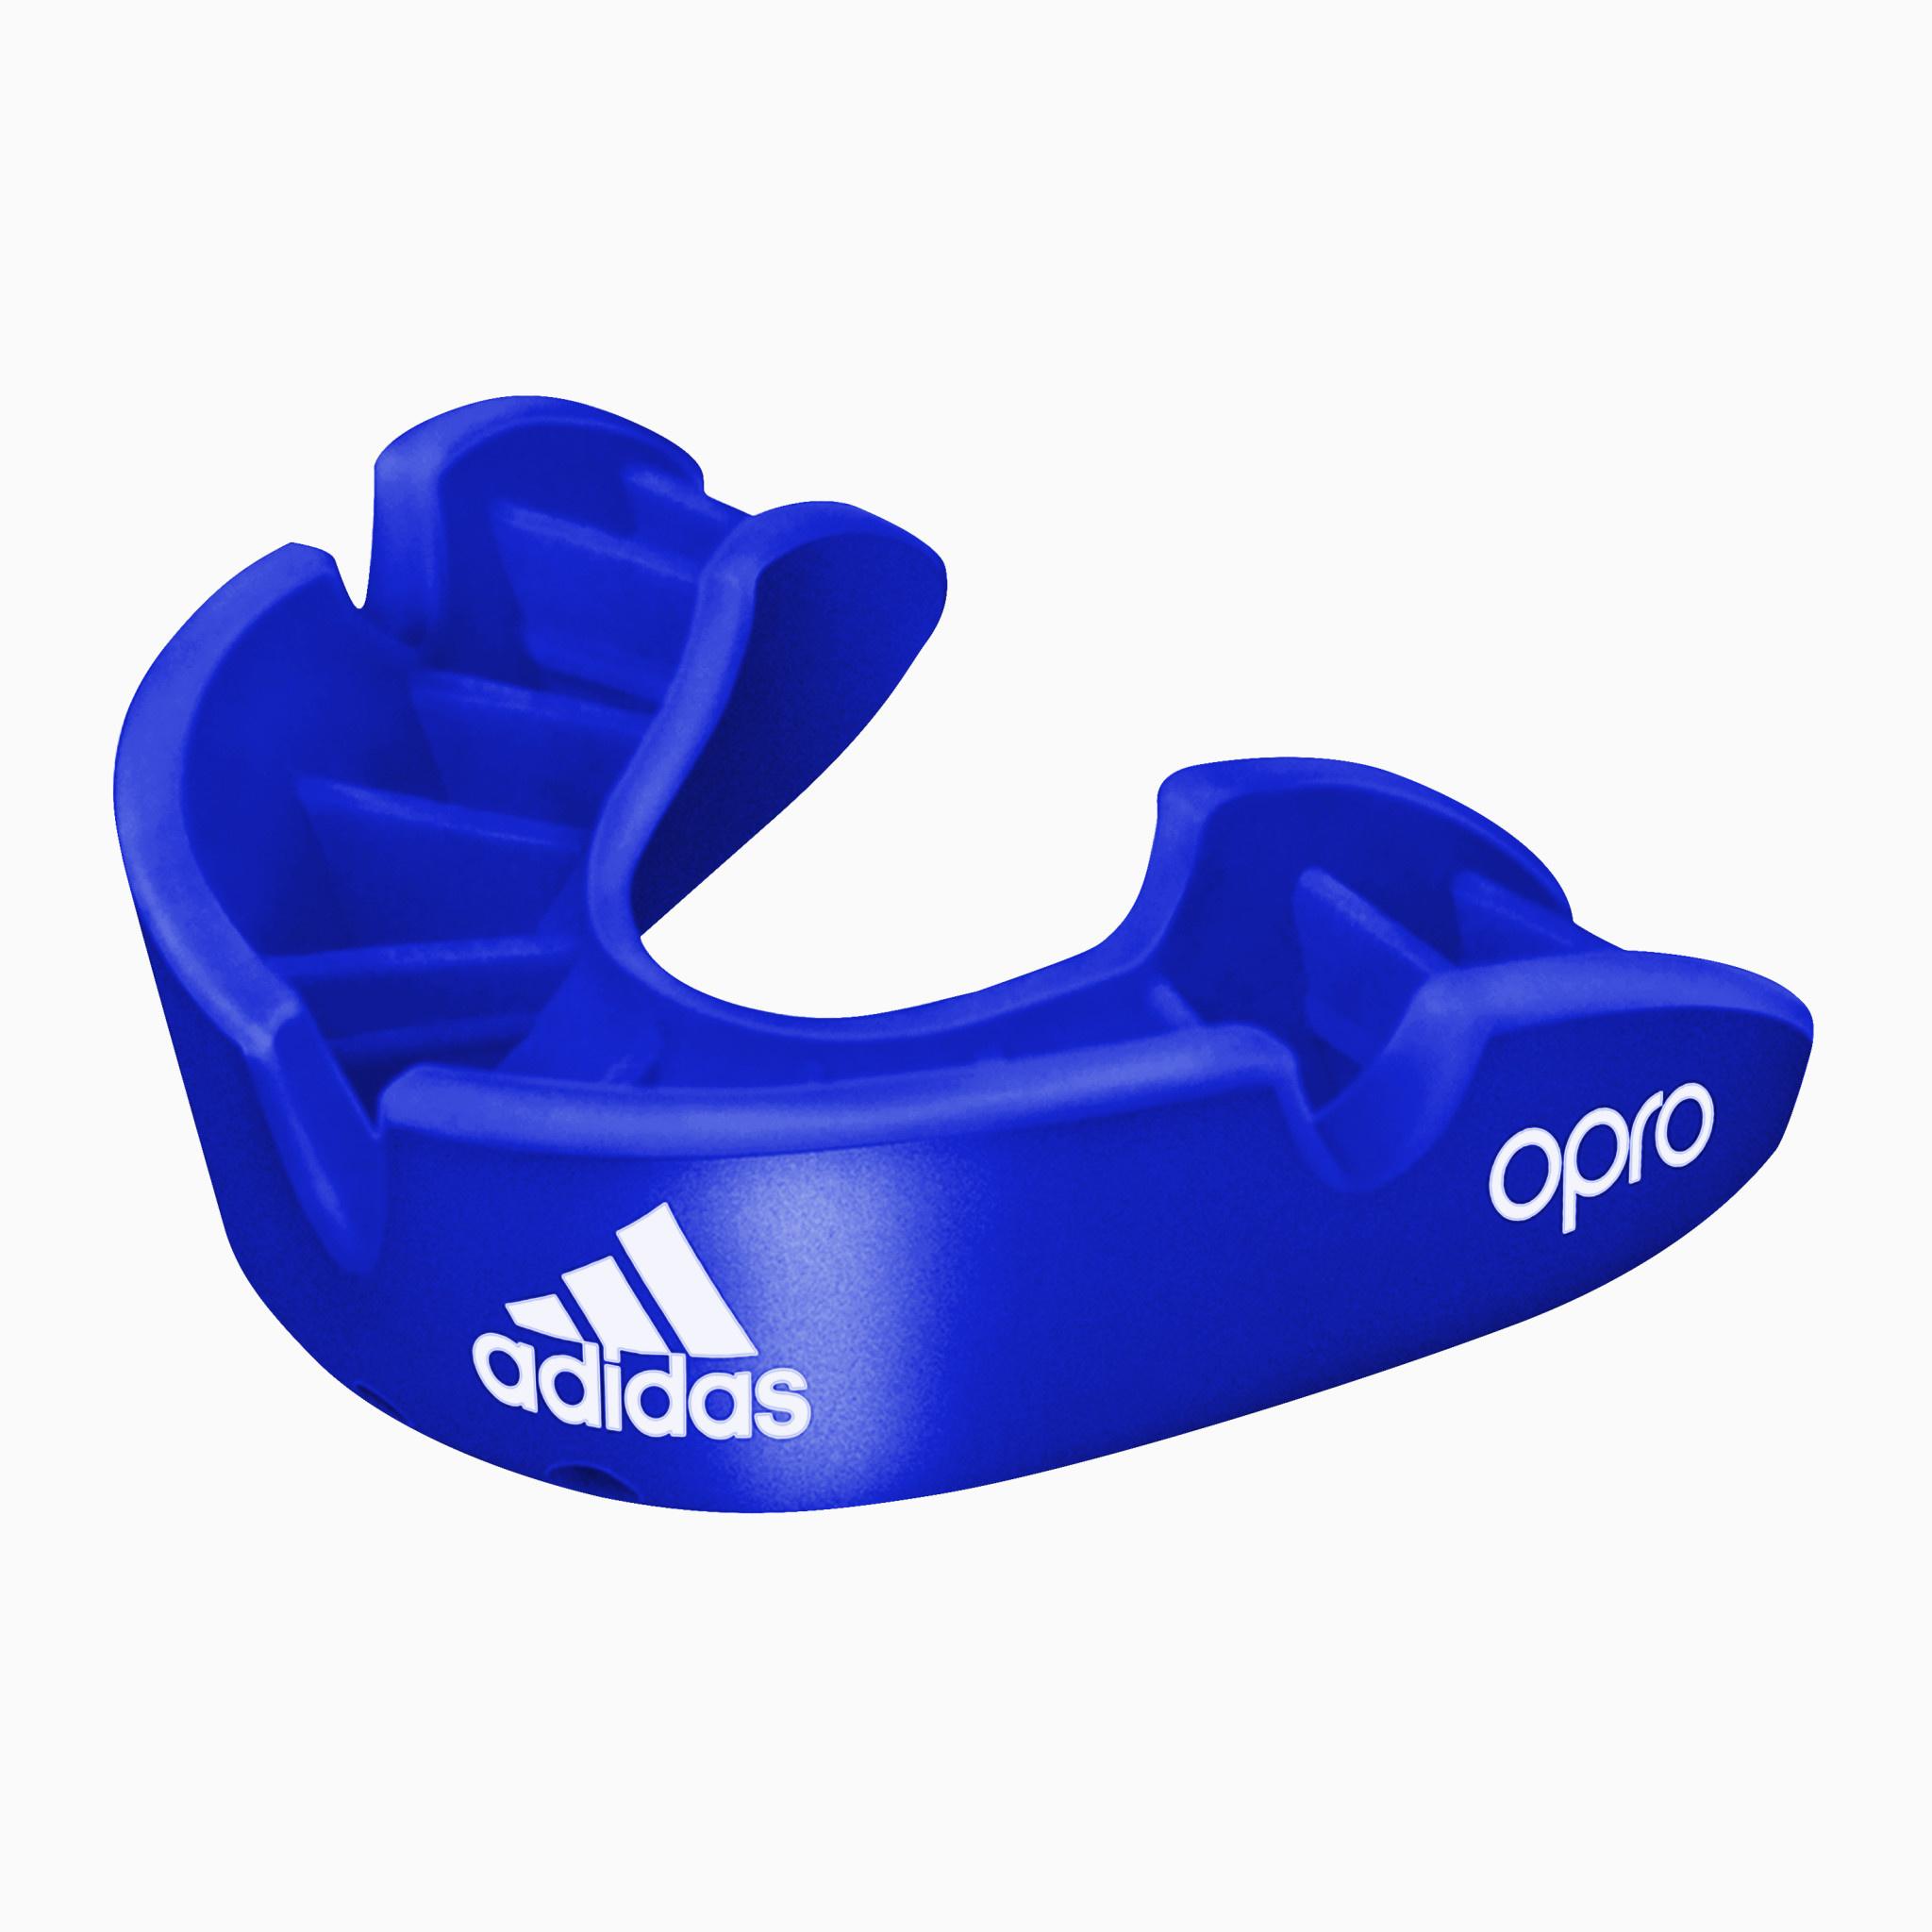 Adidas Adidas mouthguard junior brons blauw